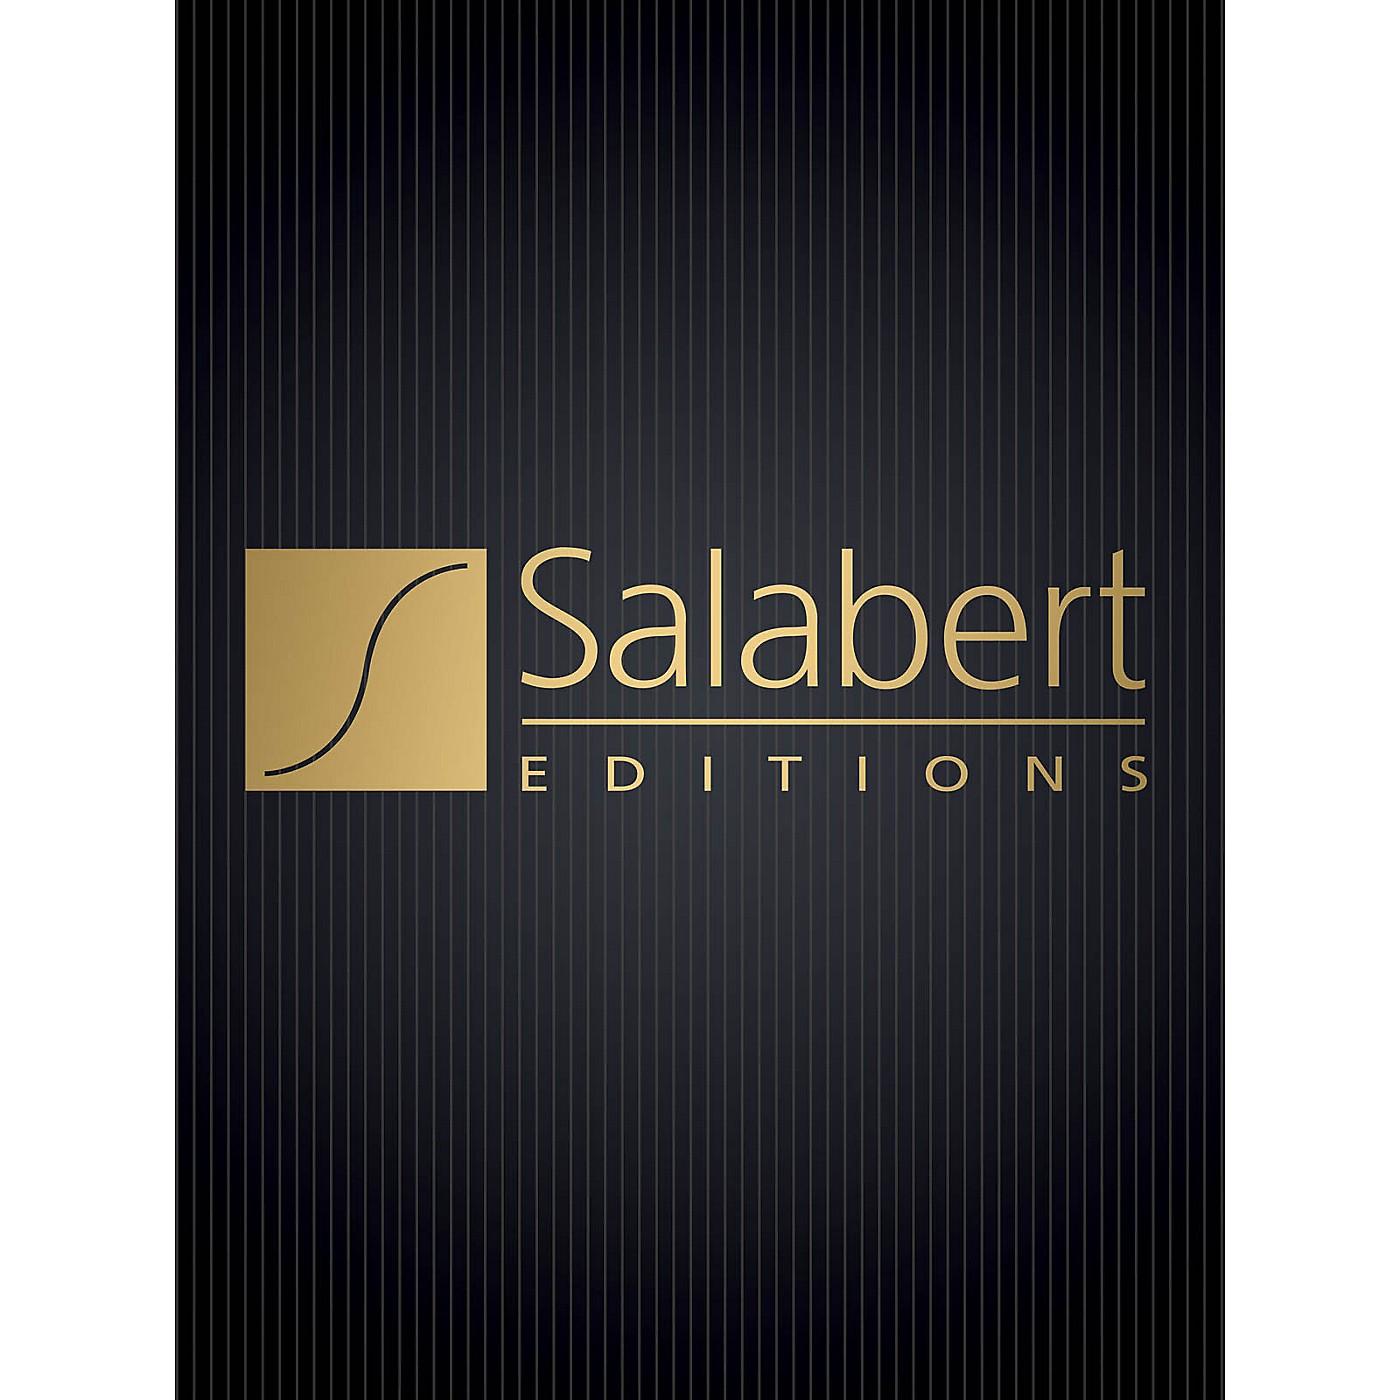 Editions Salabert Gloria (Cantata) (Study Score) Score Composed by Francis Poulenc thumbnail